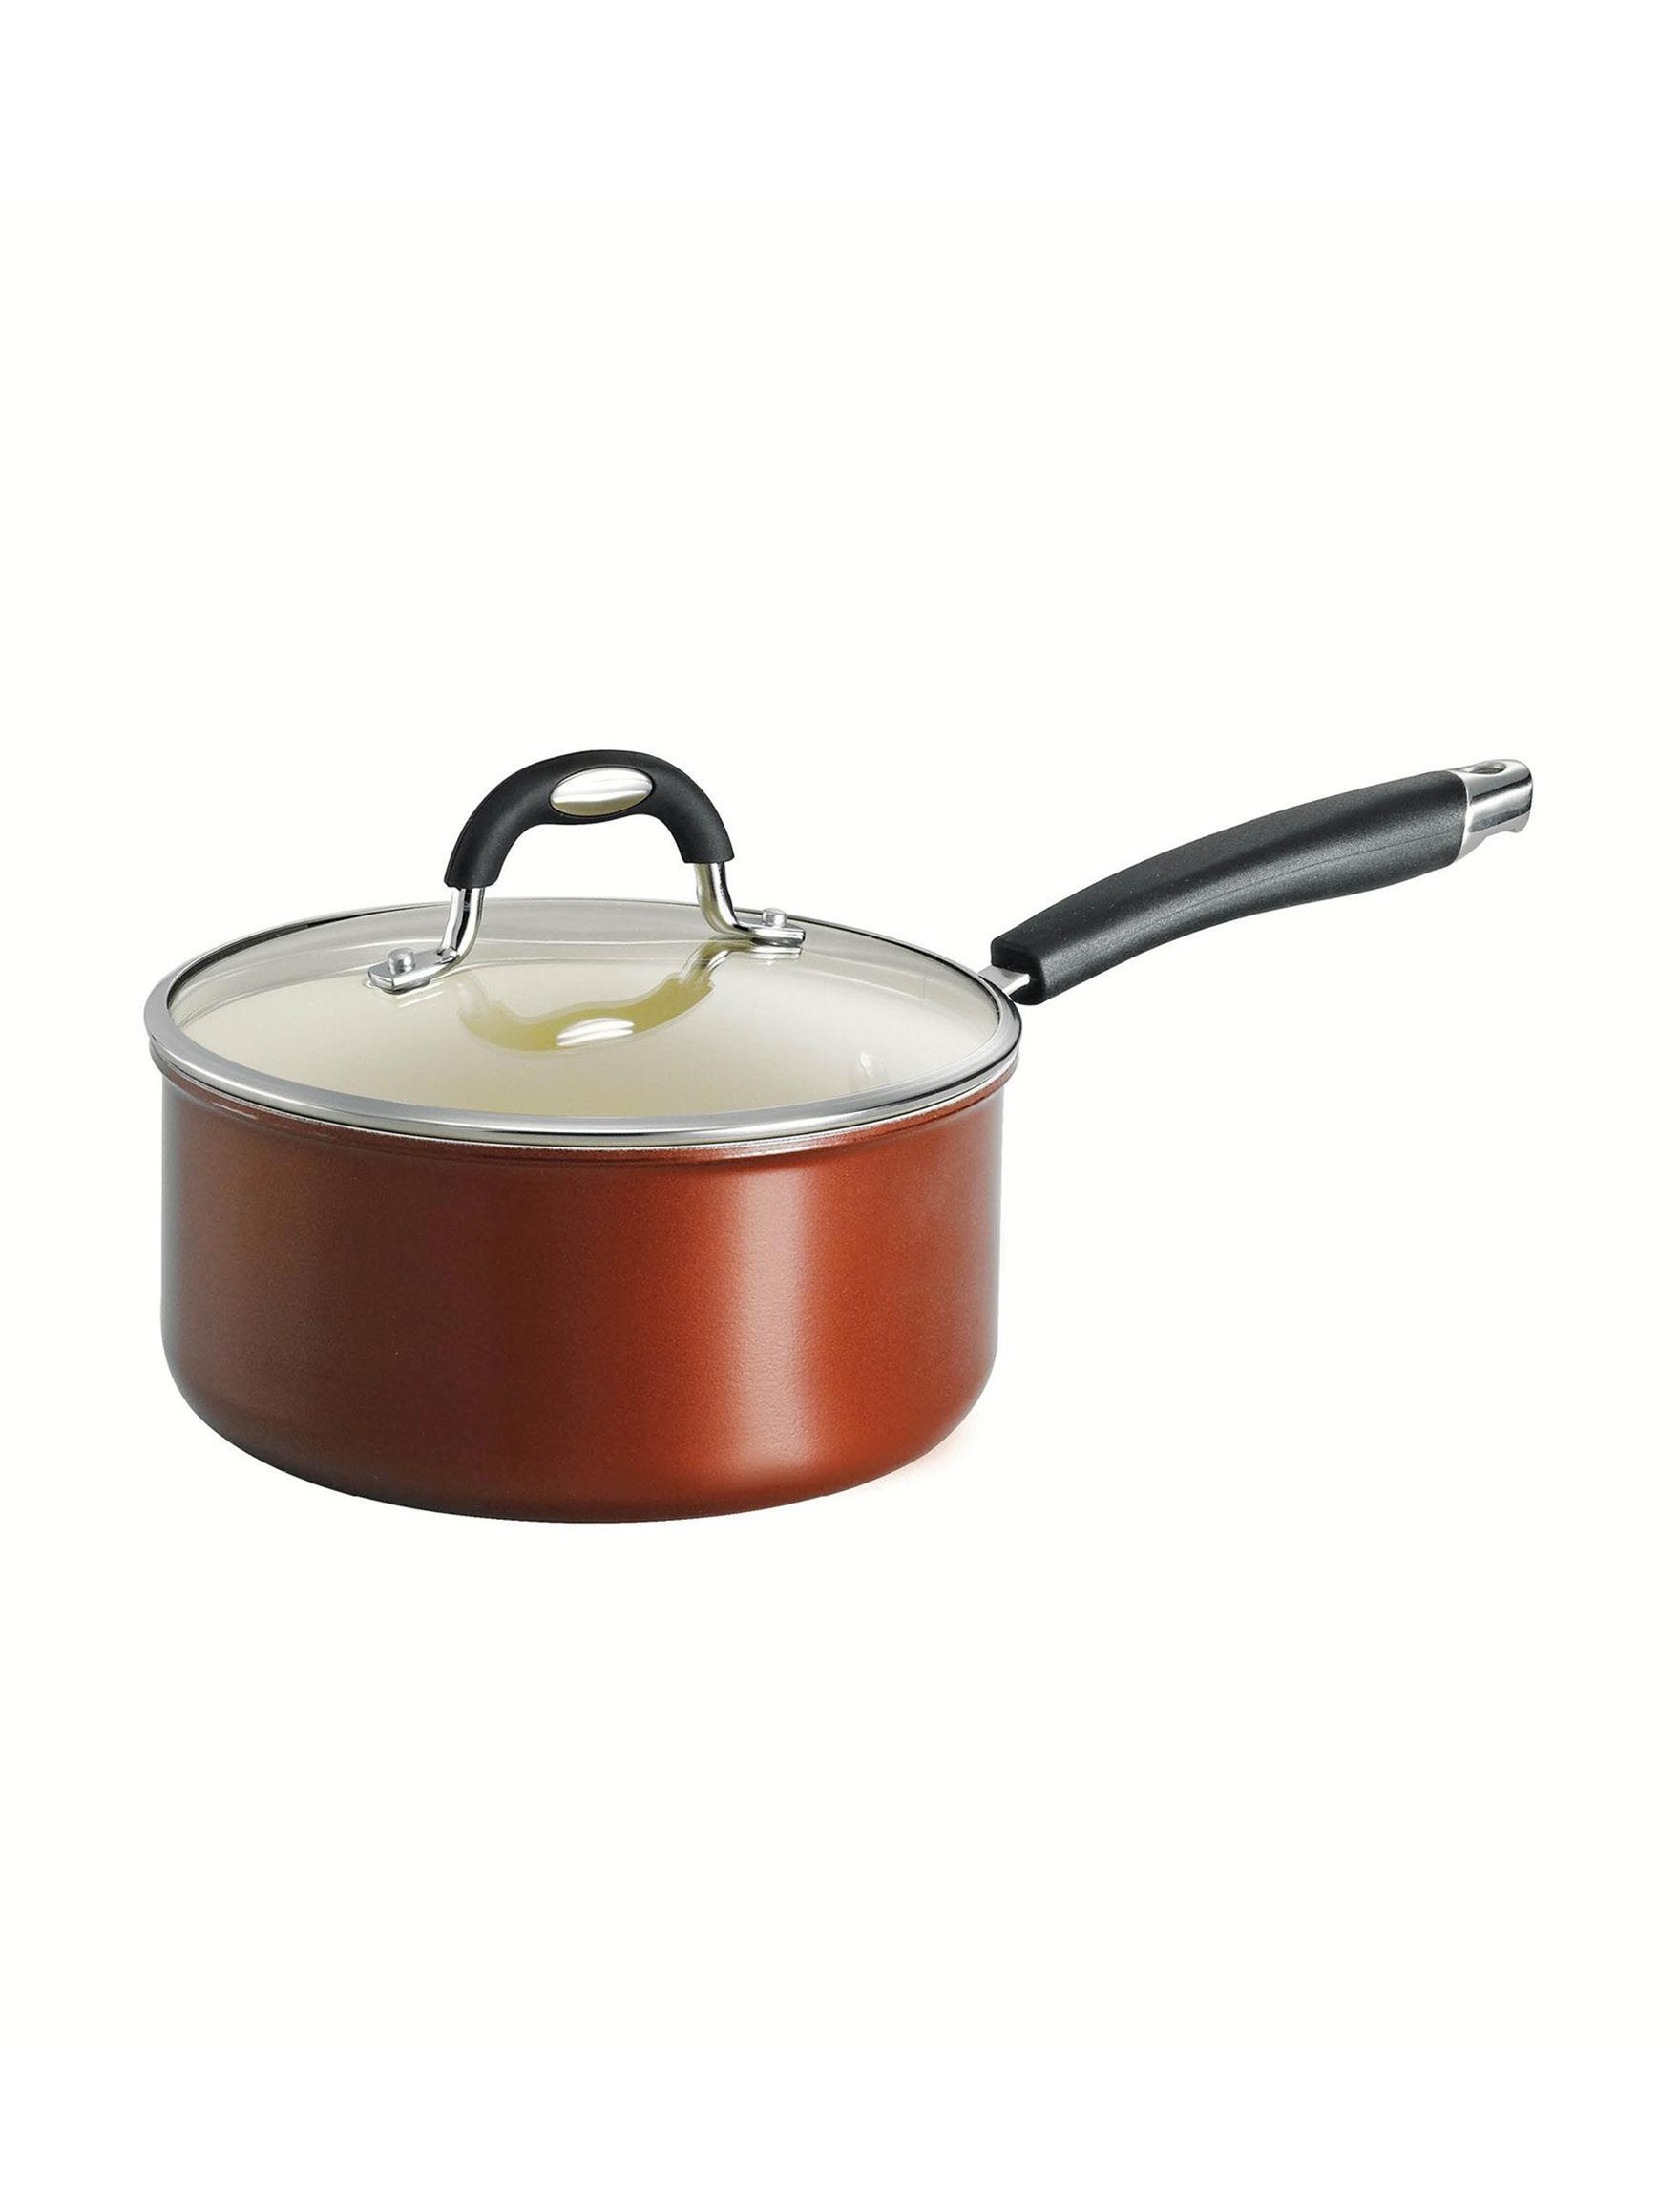 Tramontina Copper Pots & Dutch Ovens Cookware